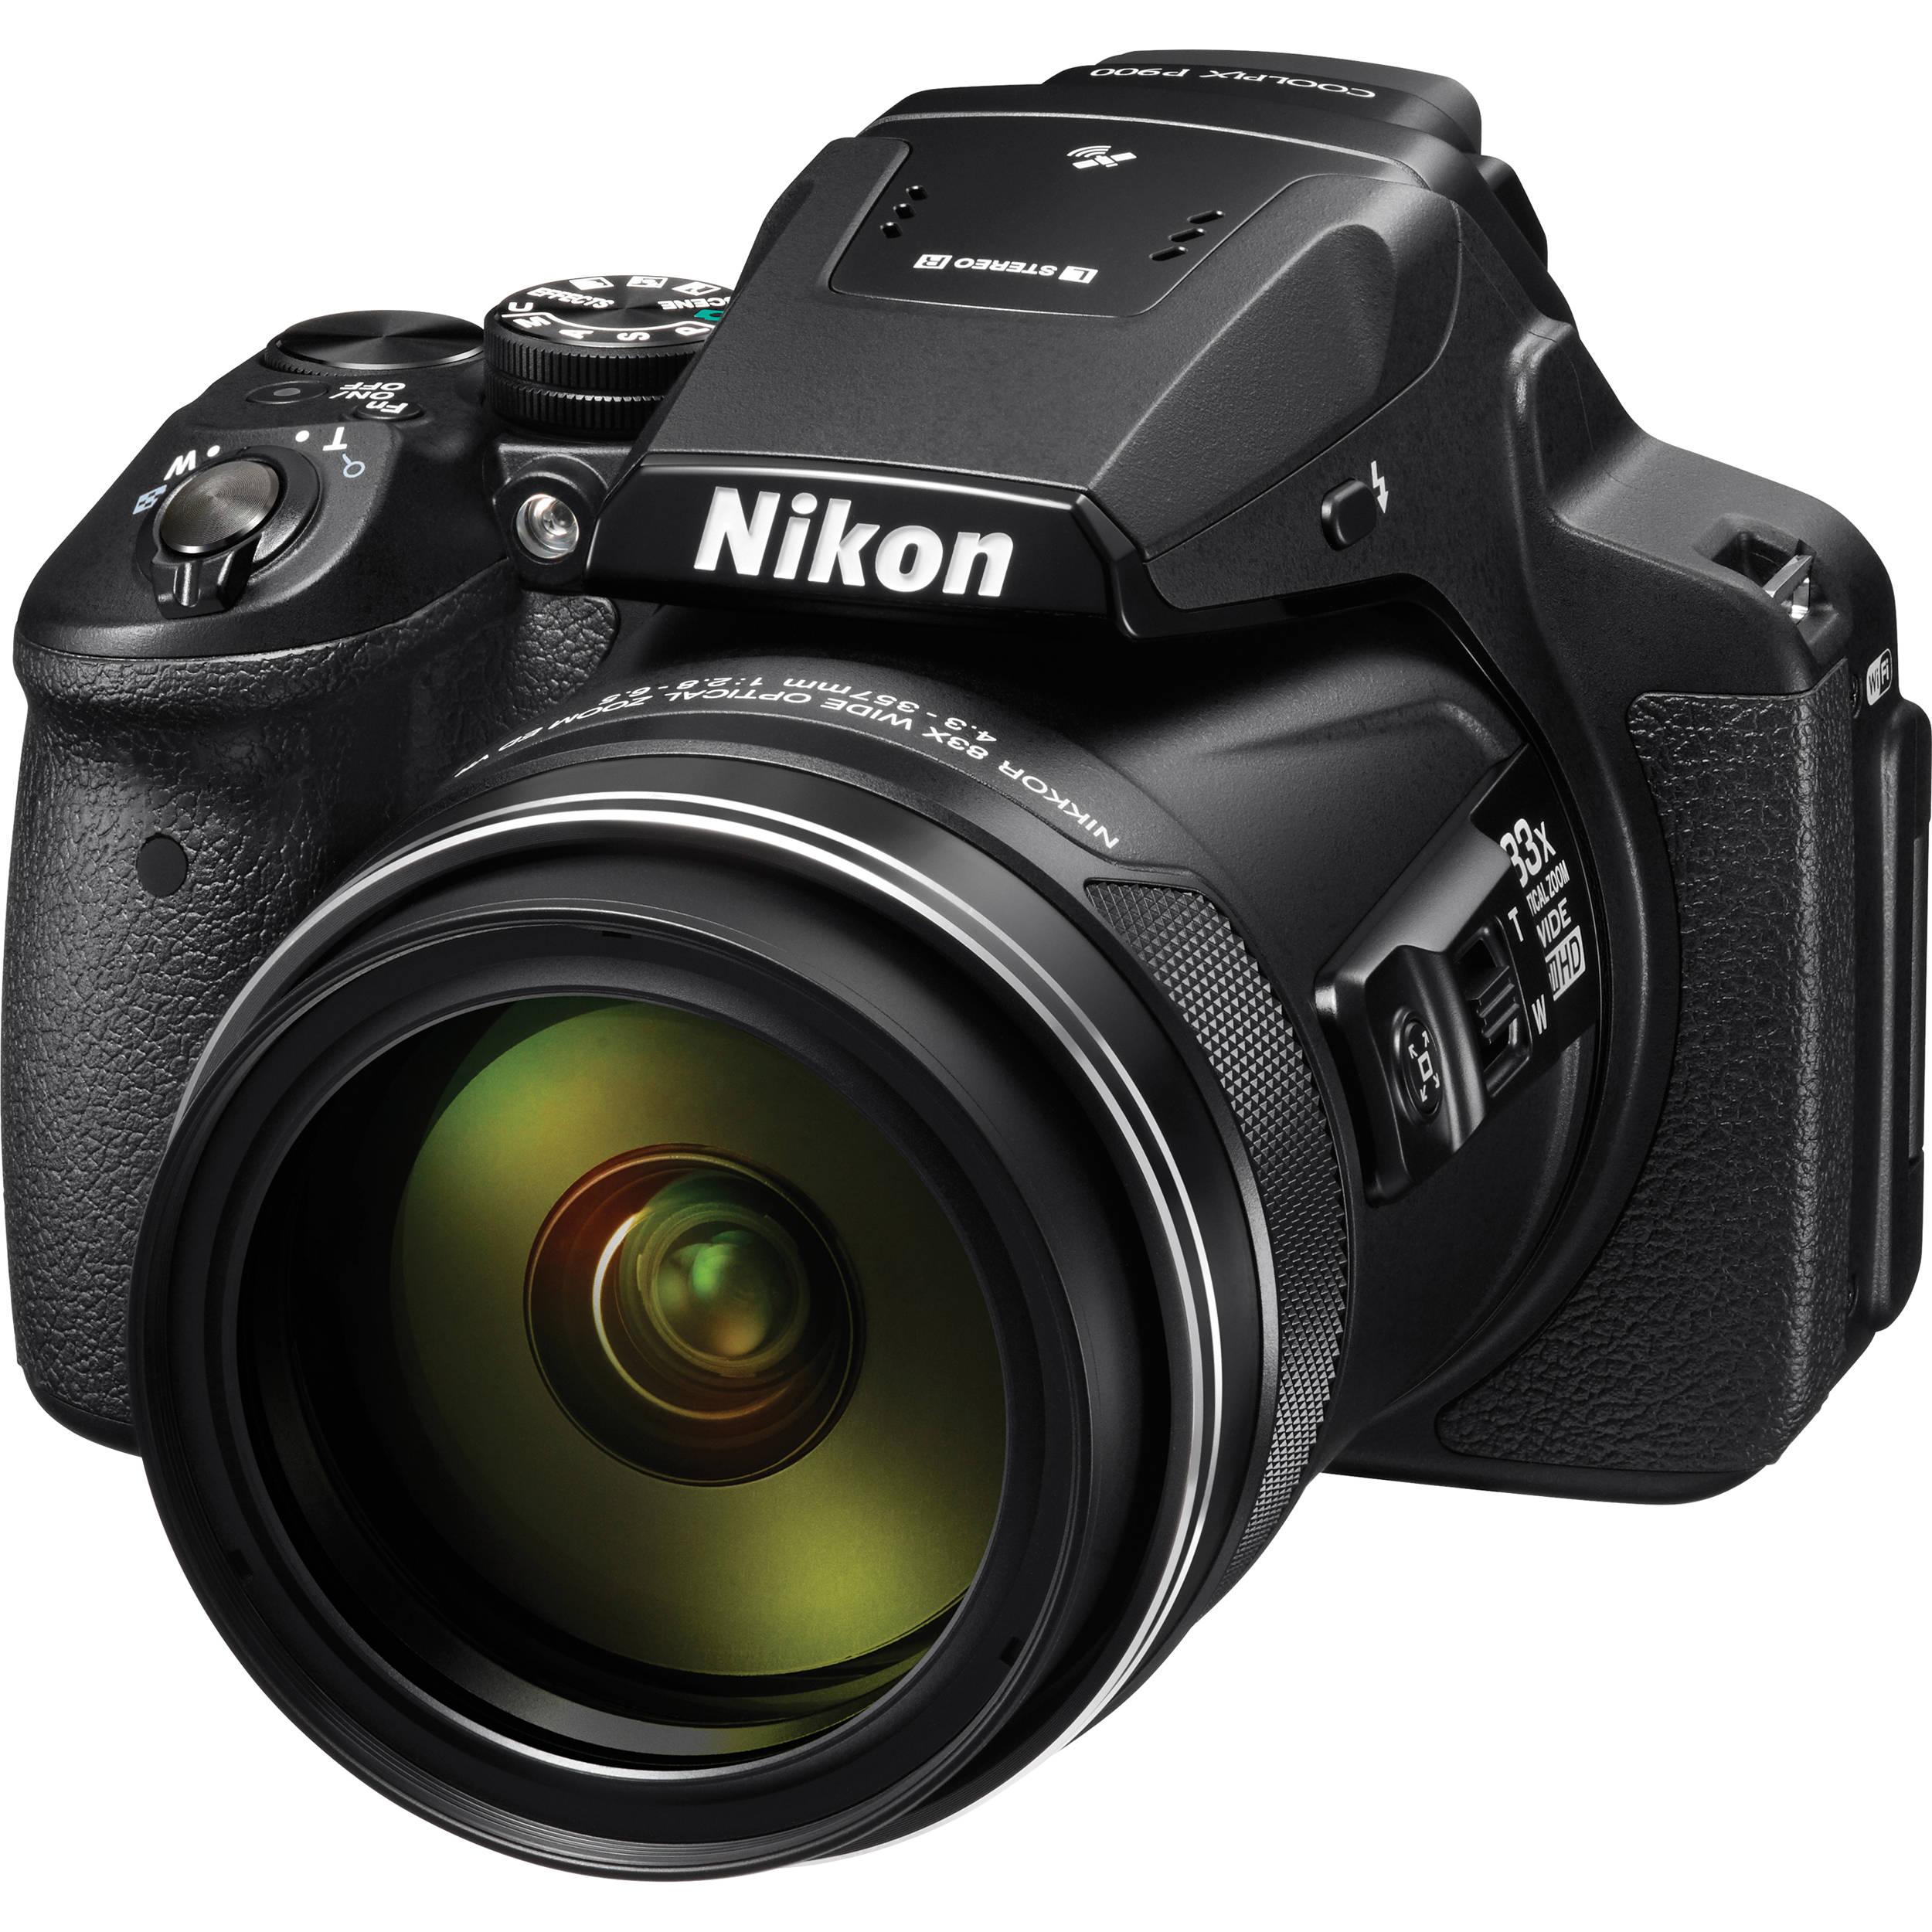 Nikon COOLPIX P900 Digital Camera (Refurbished) 26499REF B&H